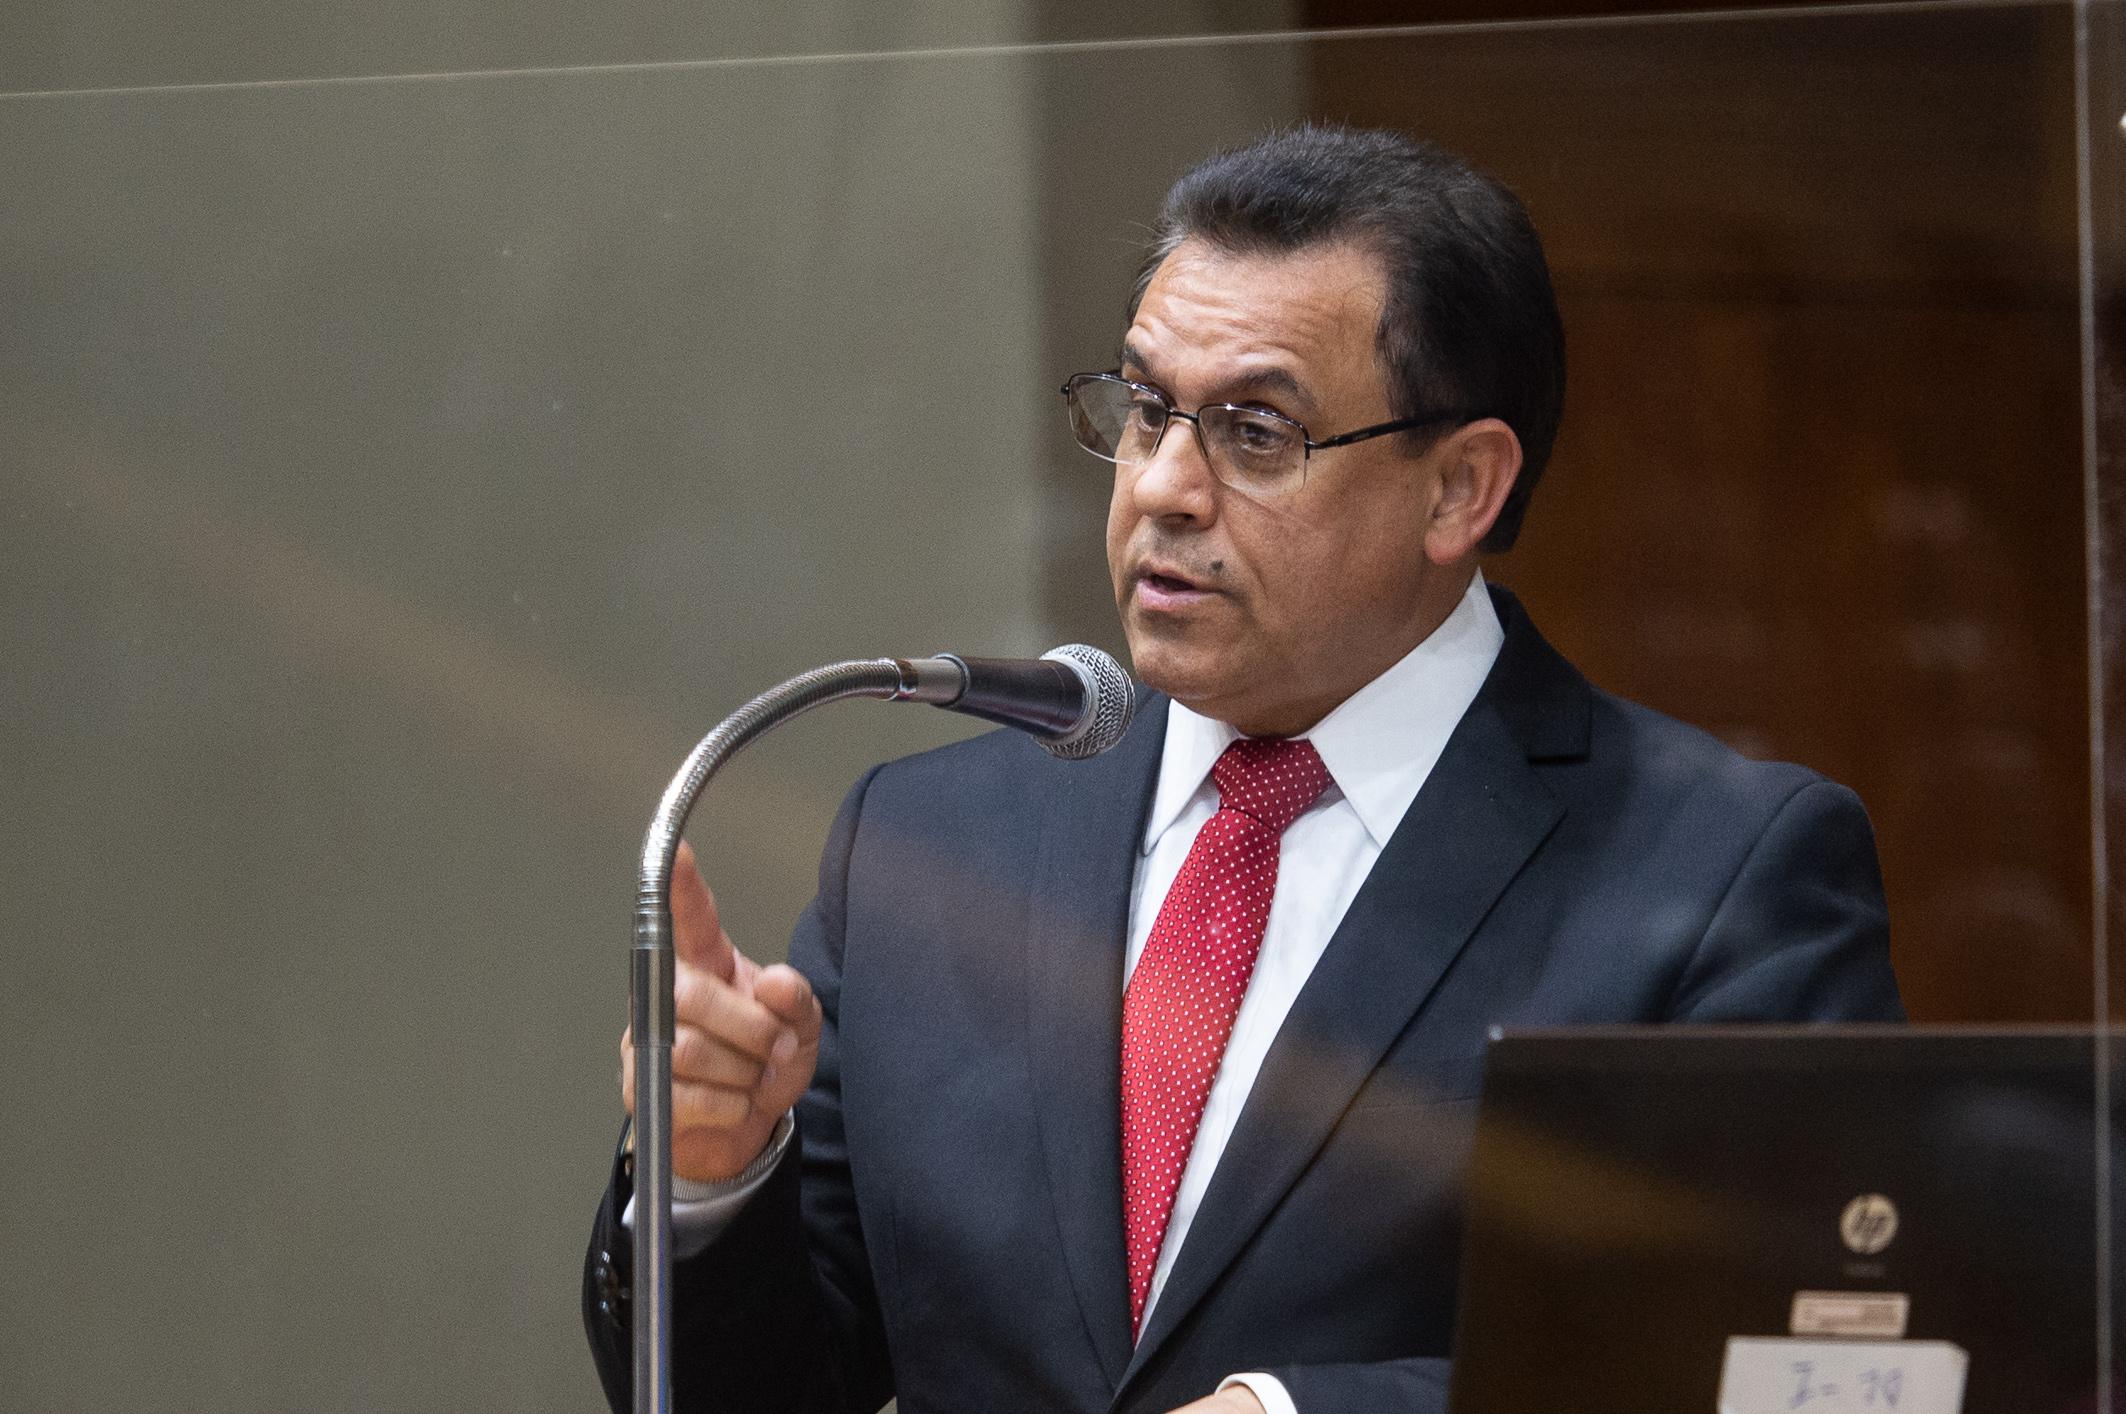 Proposta foi defendida pelo vereador Medina